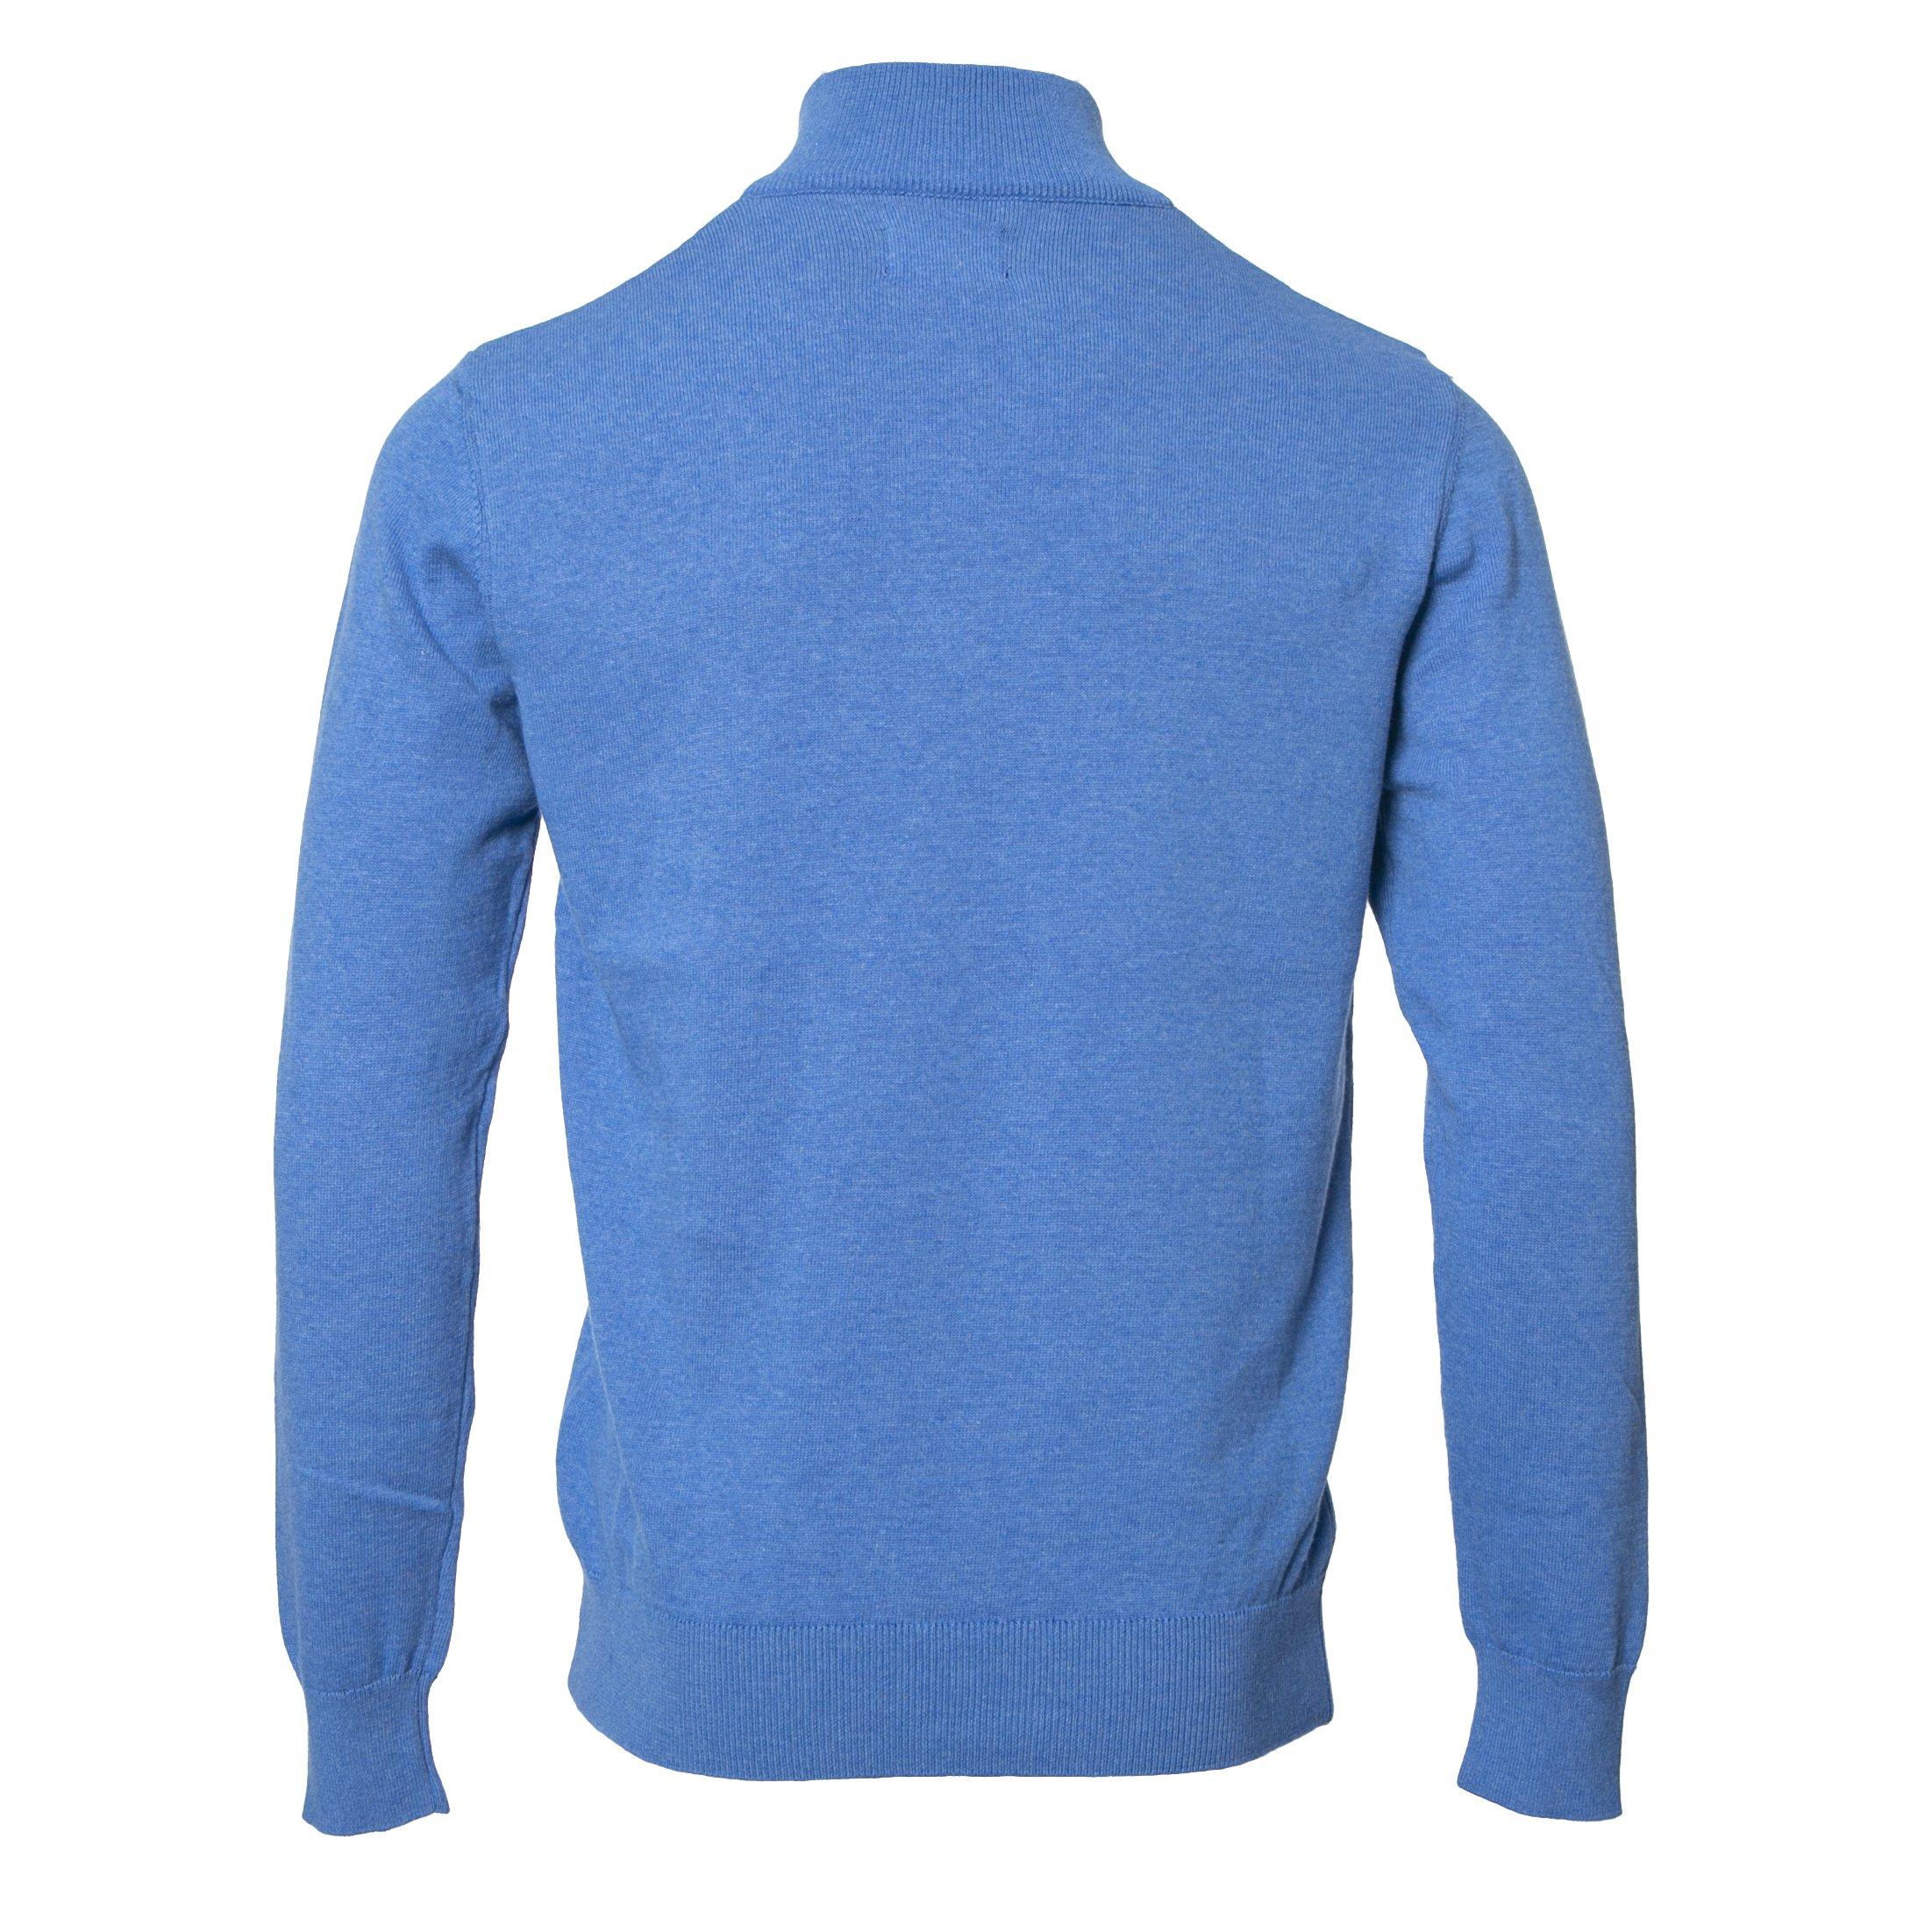 ALTIS  100% COTTON MID BLUE ZIP NECK KNITWEAR